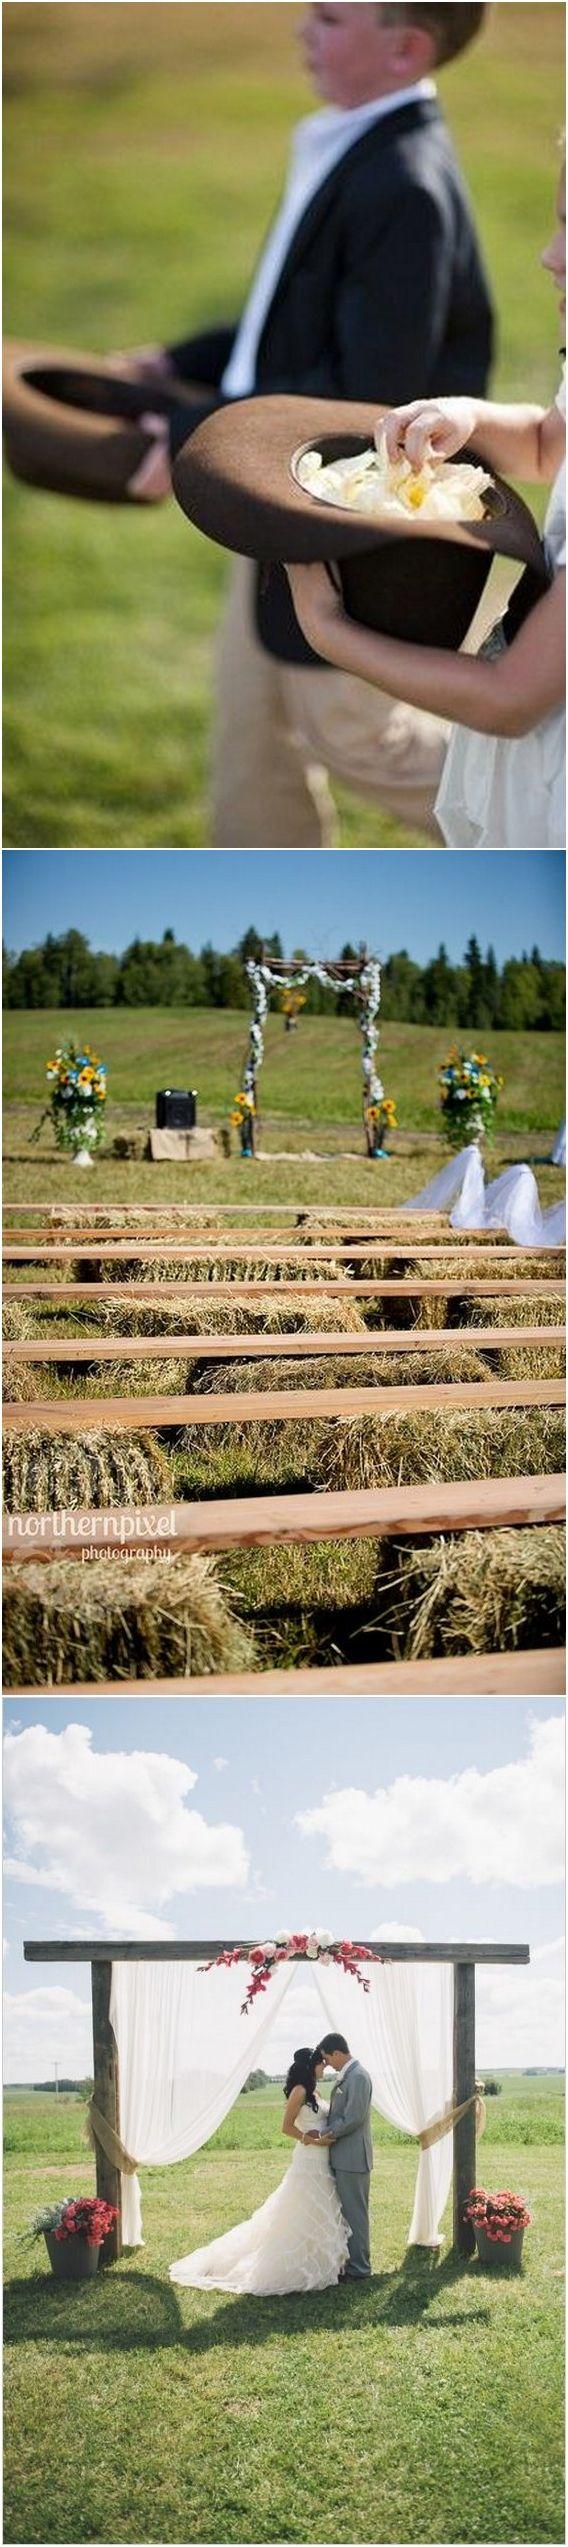 Rustic country farm wedding ideas / http://www.deerpearlflowers.com/gorgeous-ideas-for-country-farm-wedding/2/